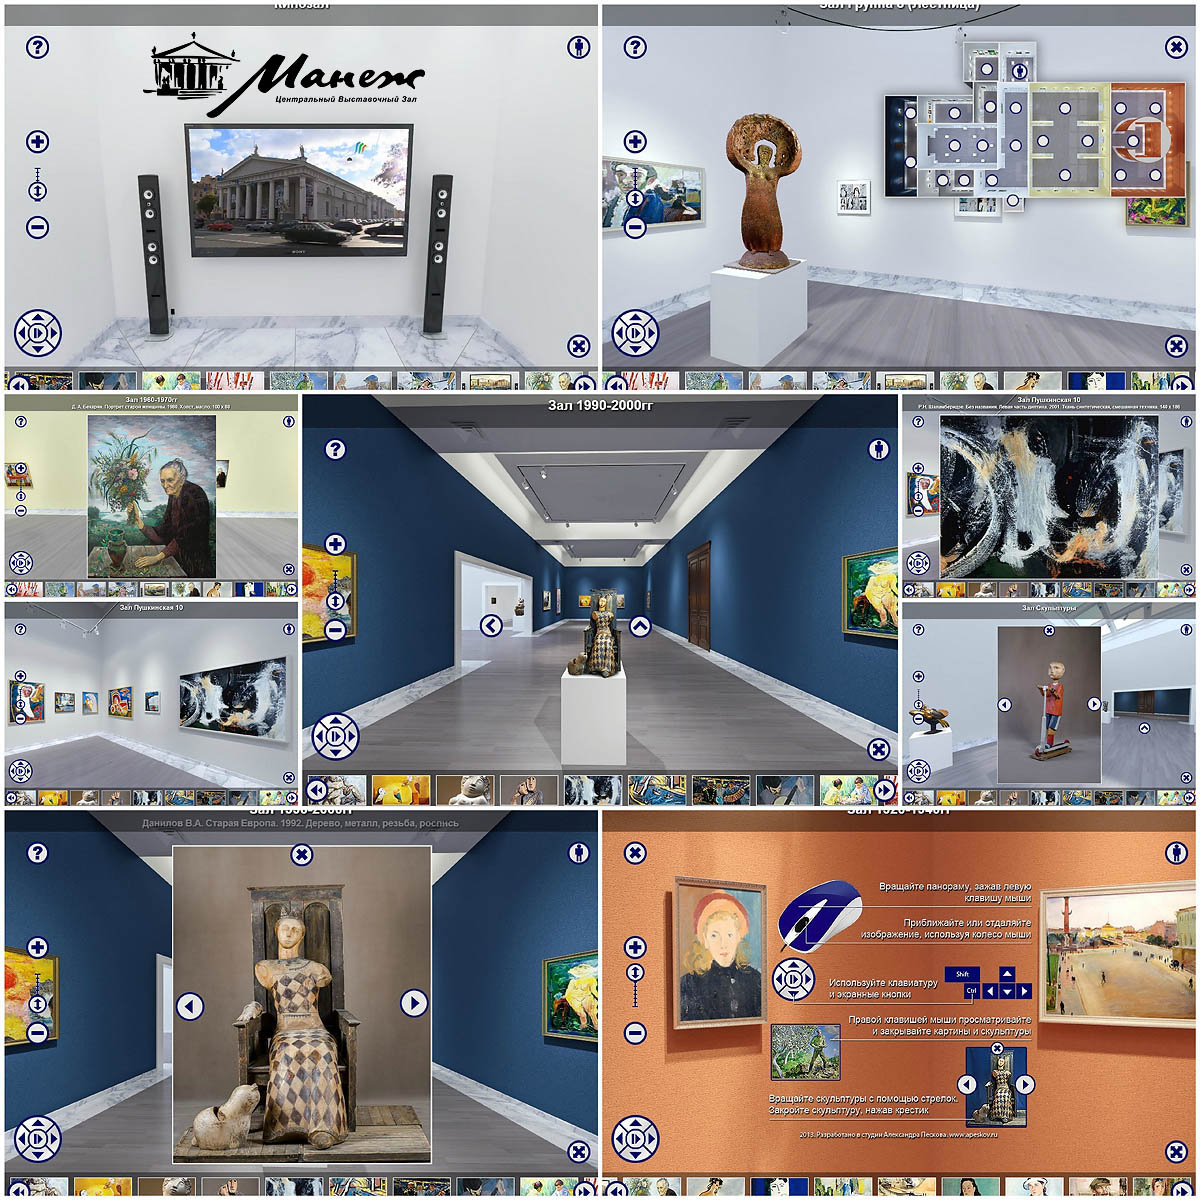 Виртуальный тур Центральному Выставочному Залу Манеж